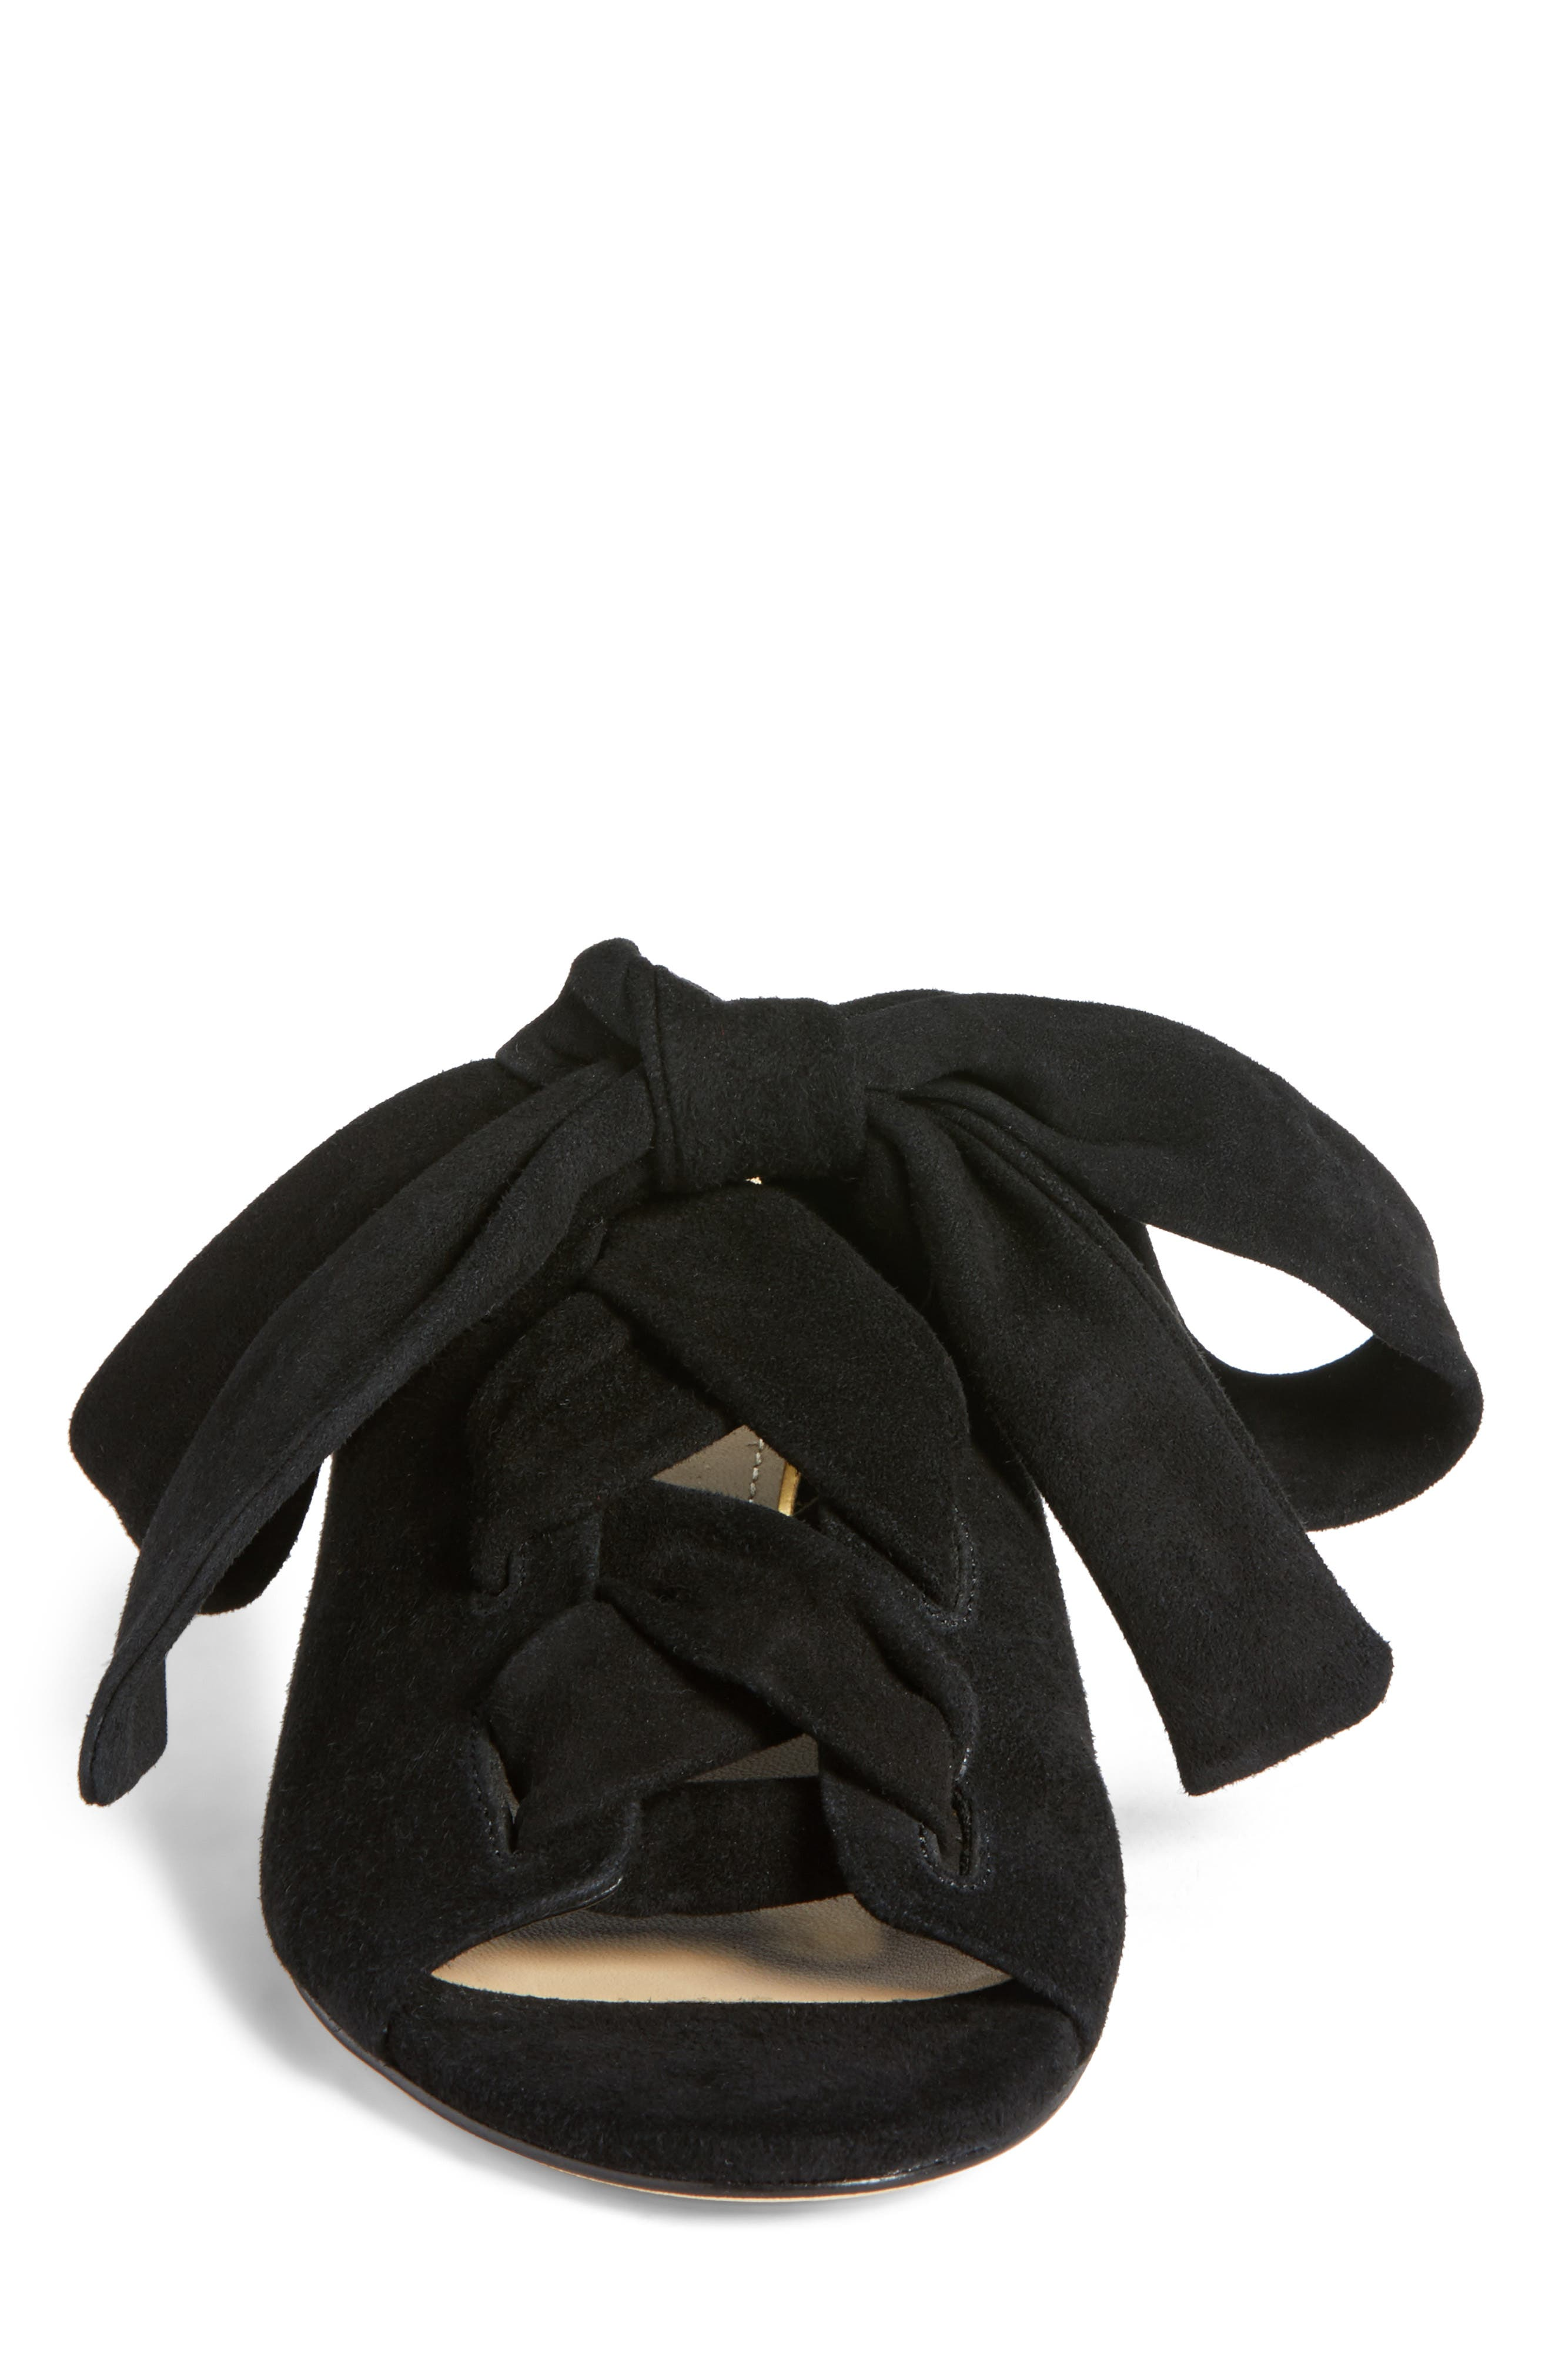 Bermuda Sandal,                             Alternate thumbnail 4, color,                             Black Suede